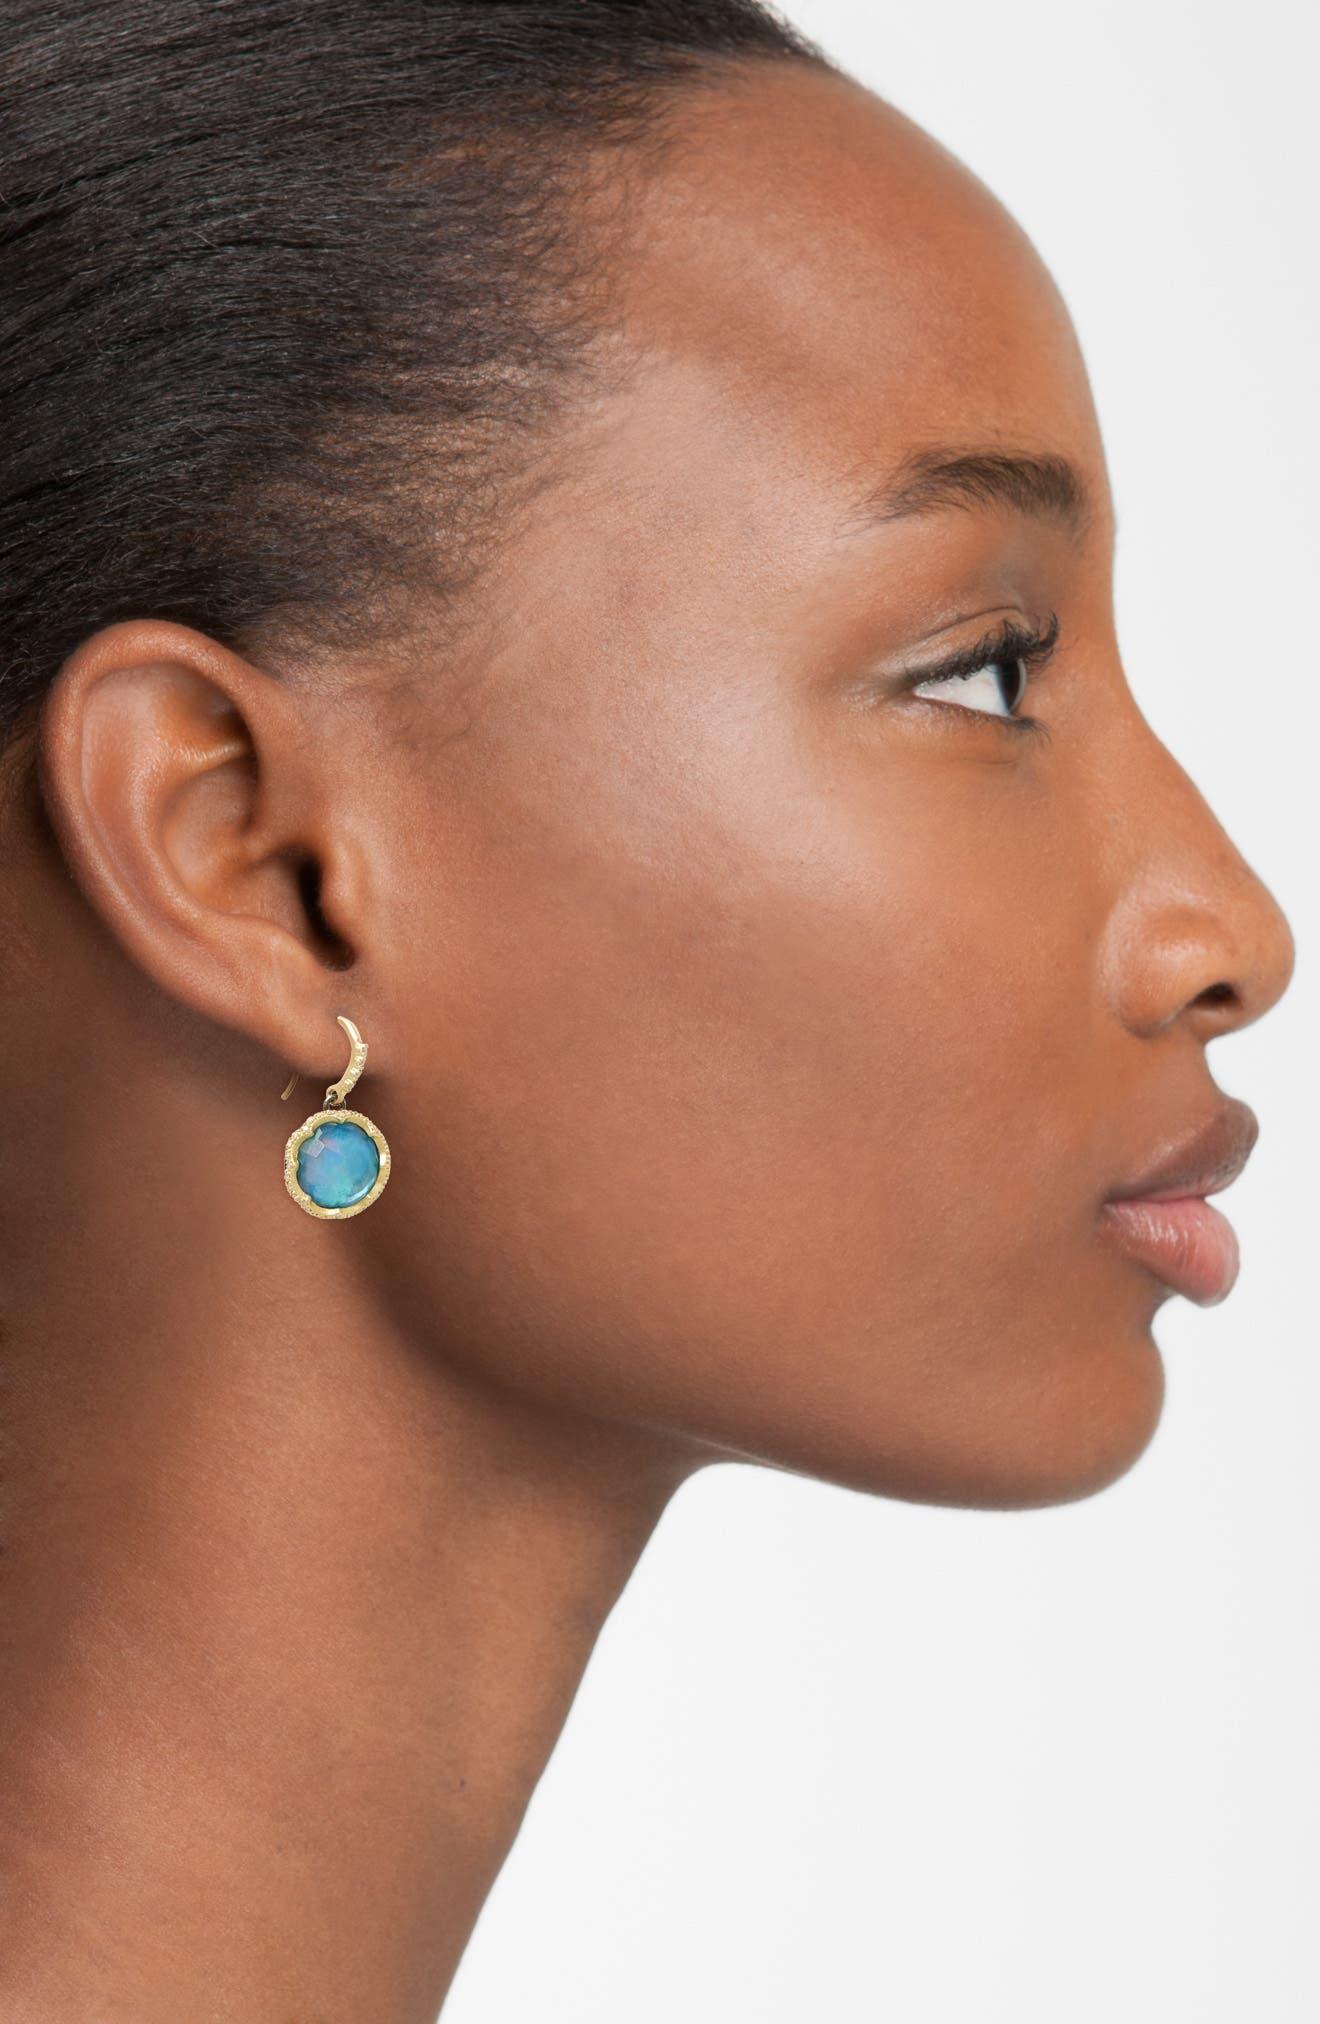 Old World Opal Drop Earrings,                             Alternate thumbnail 2, color,                             710